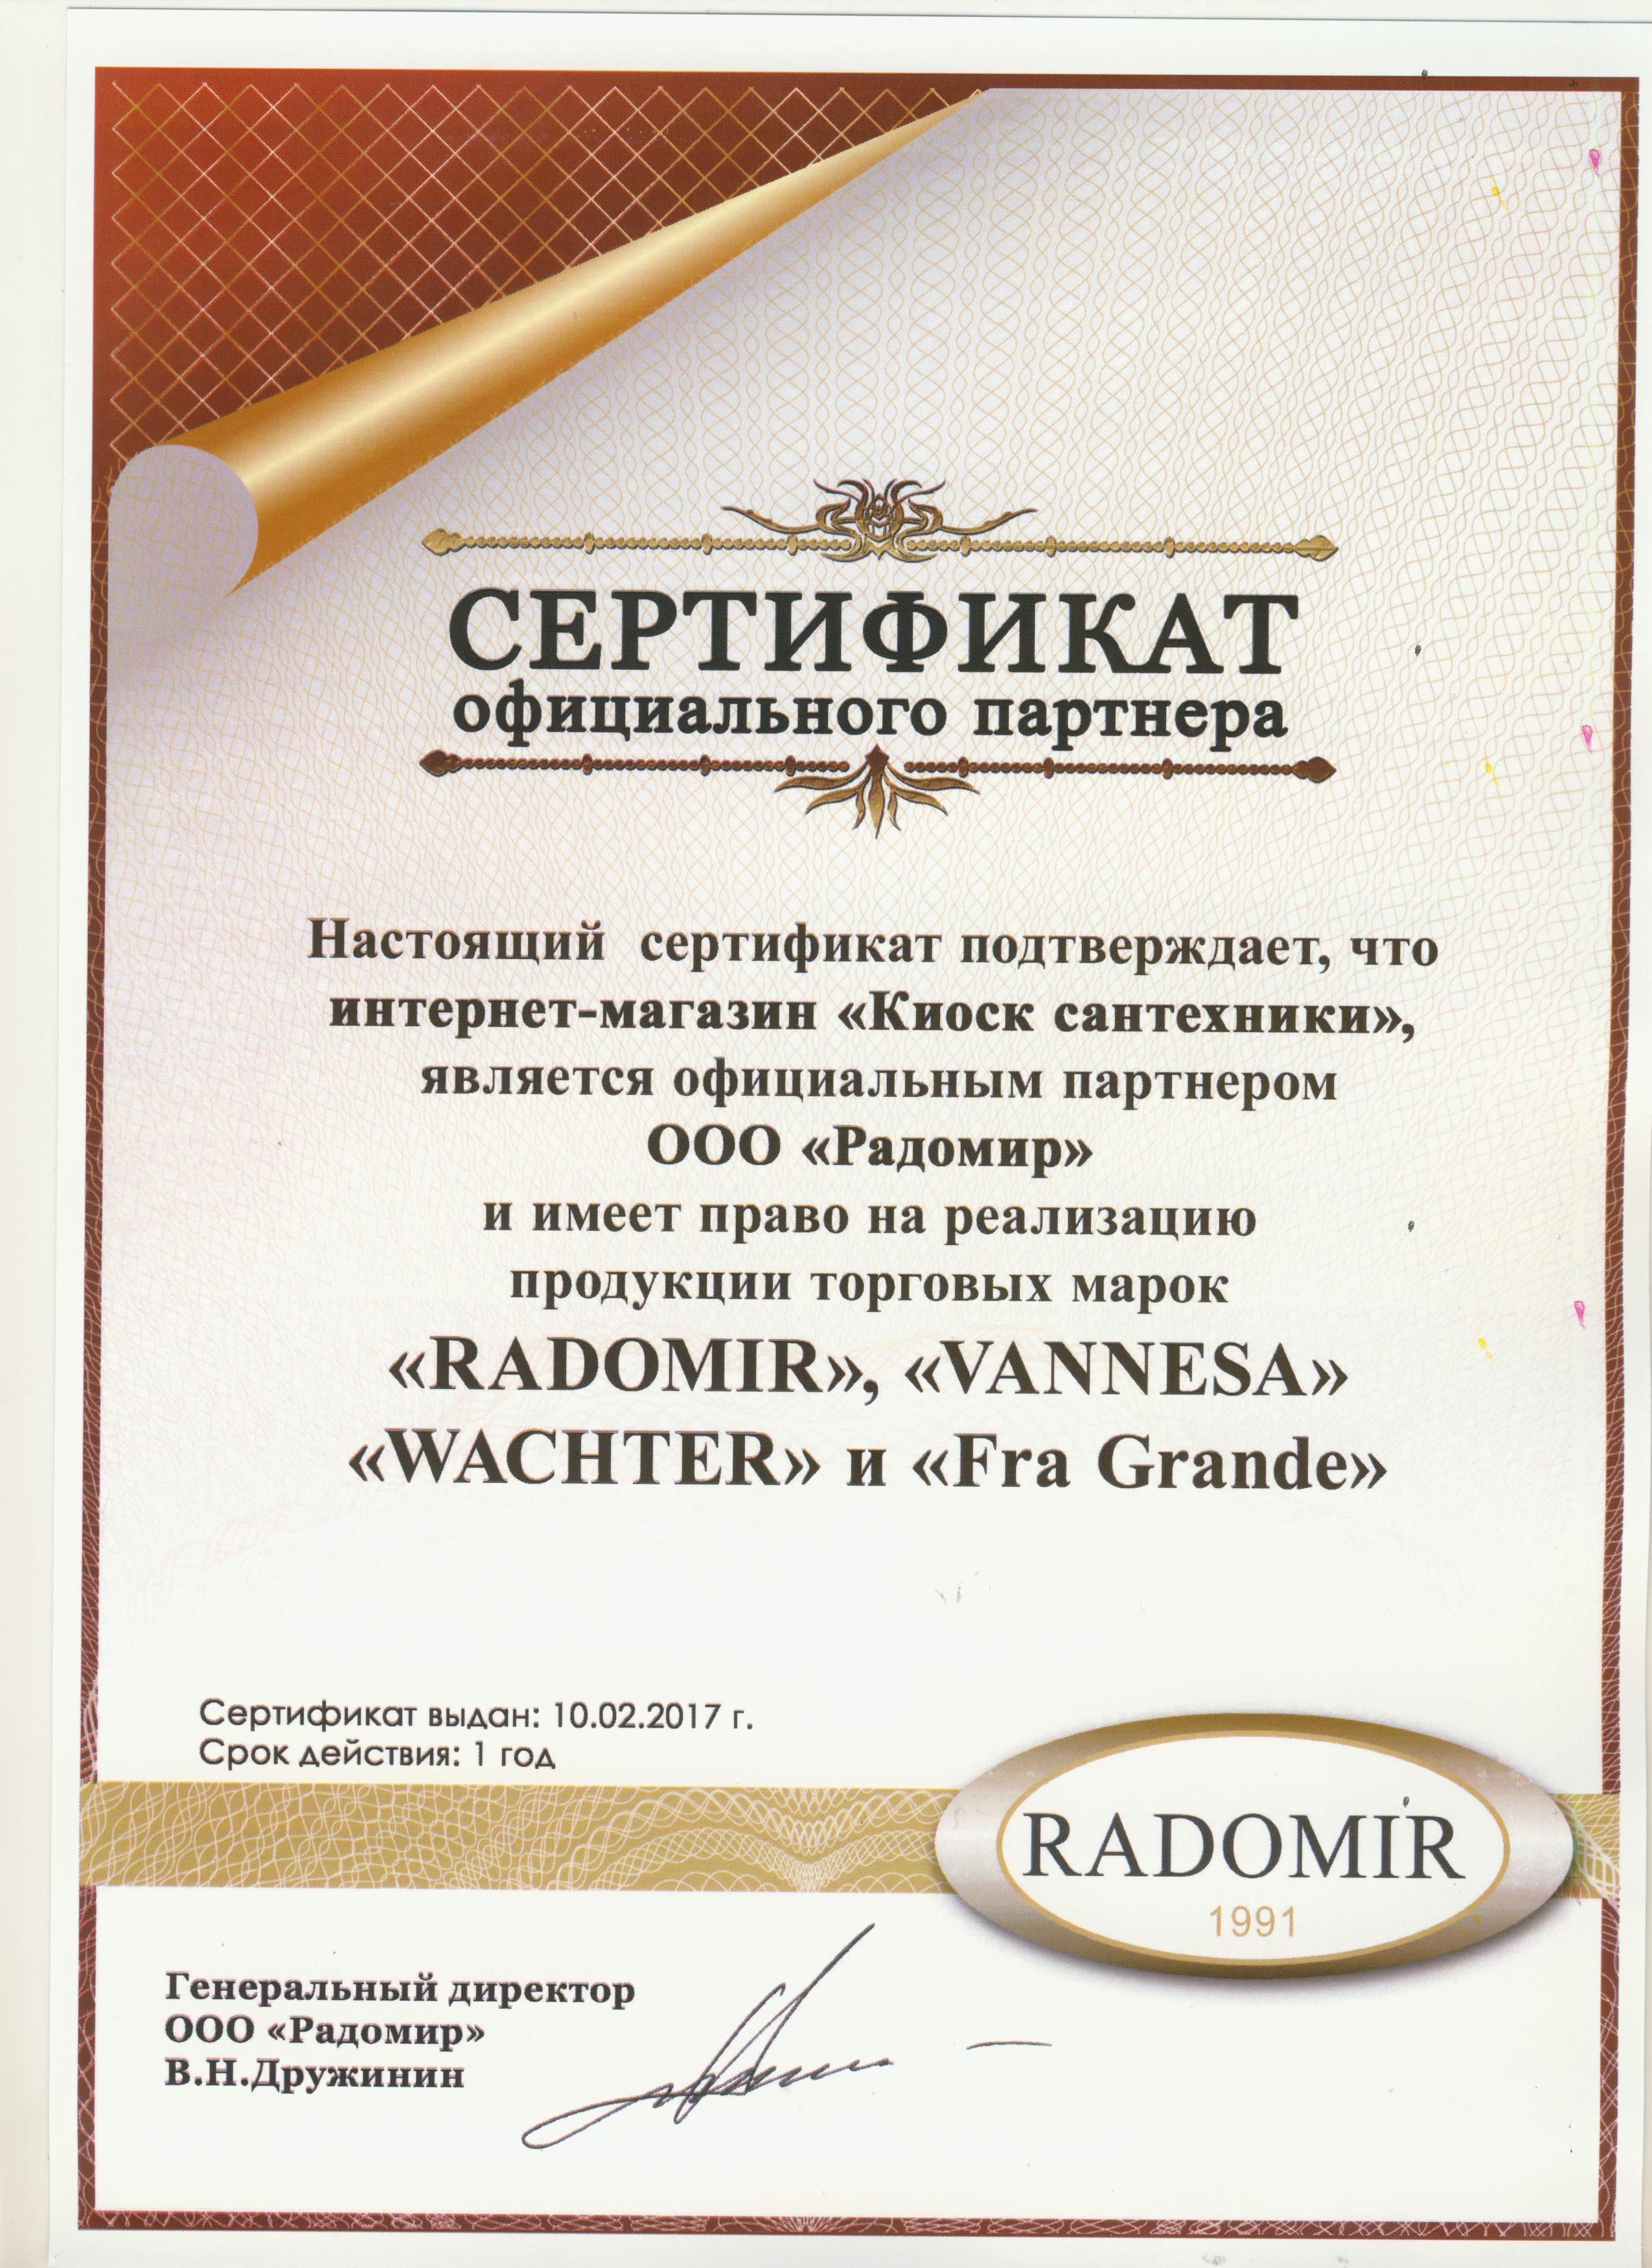 Фото 5948: Гидромассажная ванна Радомир (Radomir) ЛАГУНА WHITE серия Сomfort